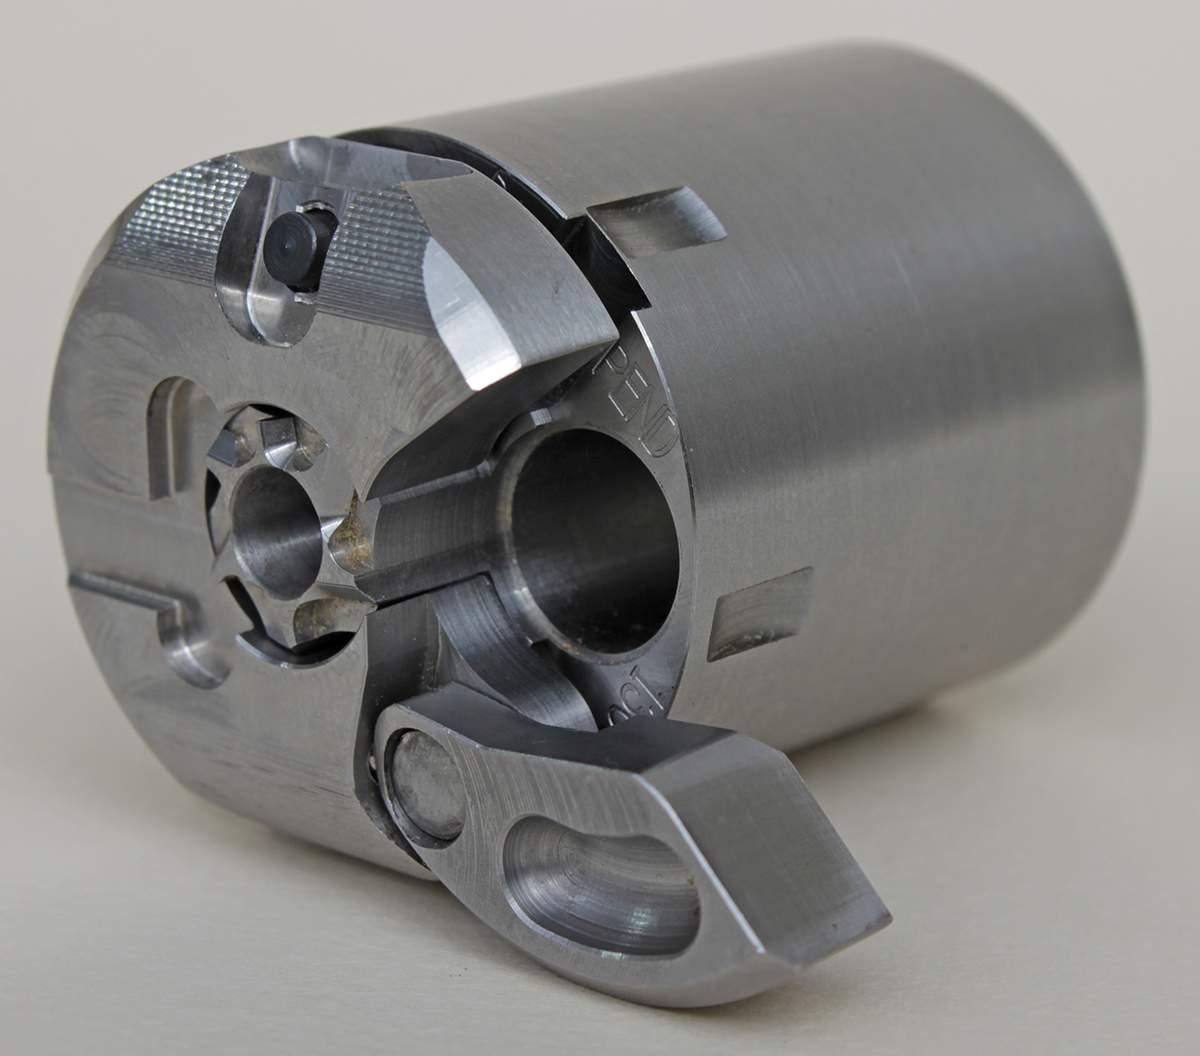 1858 Remington revolver | Cartridge conversion for 58 Remington